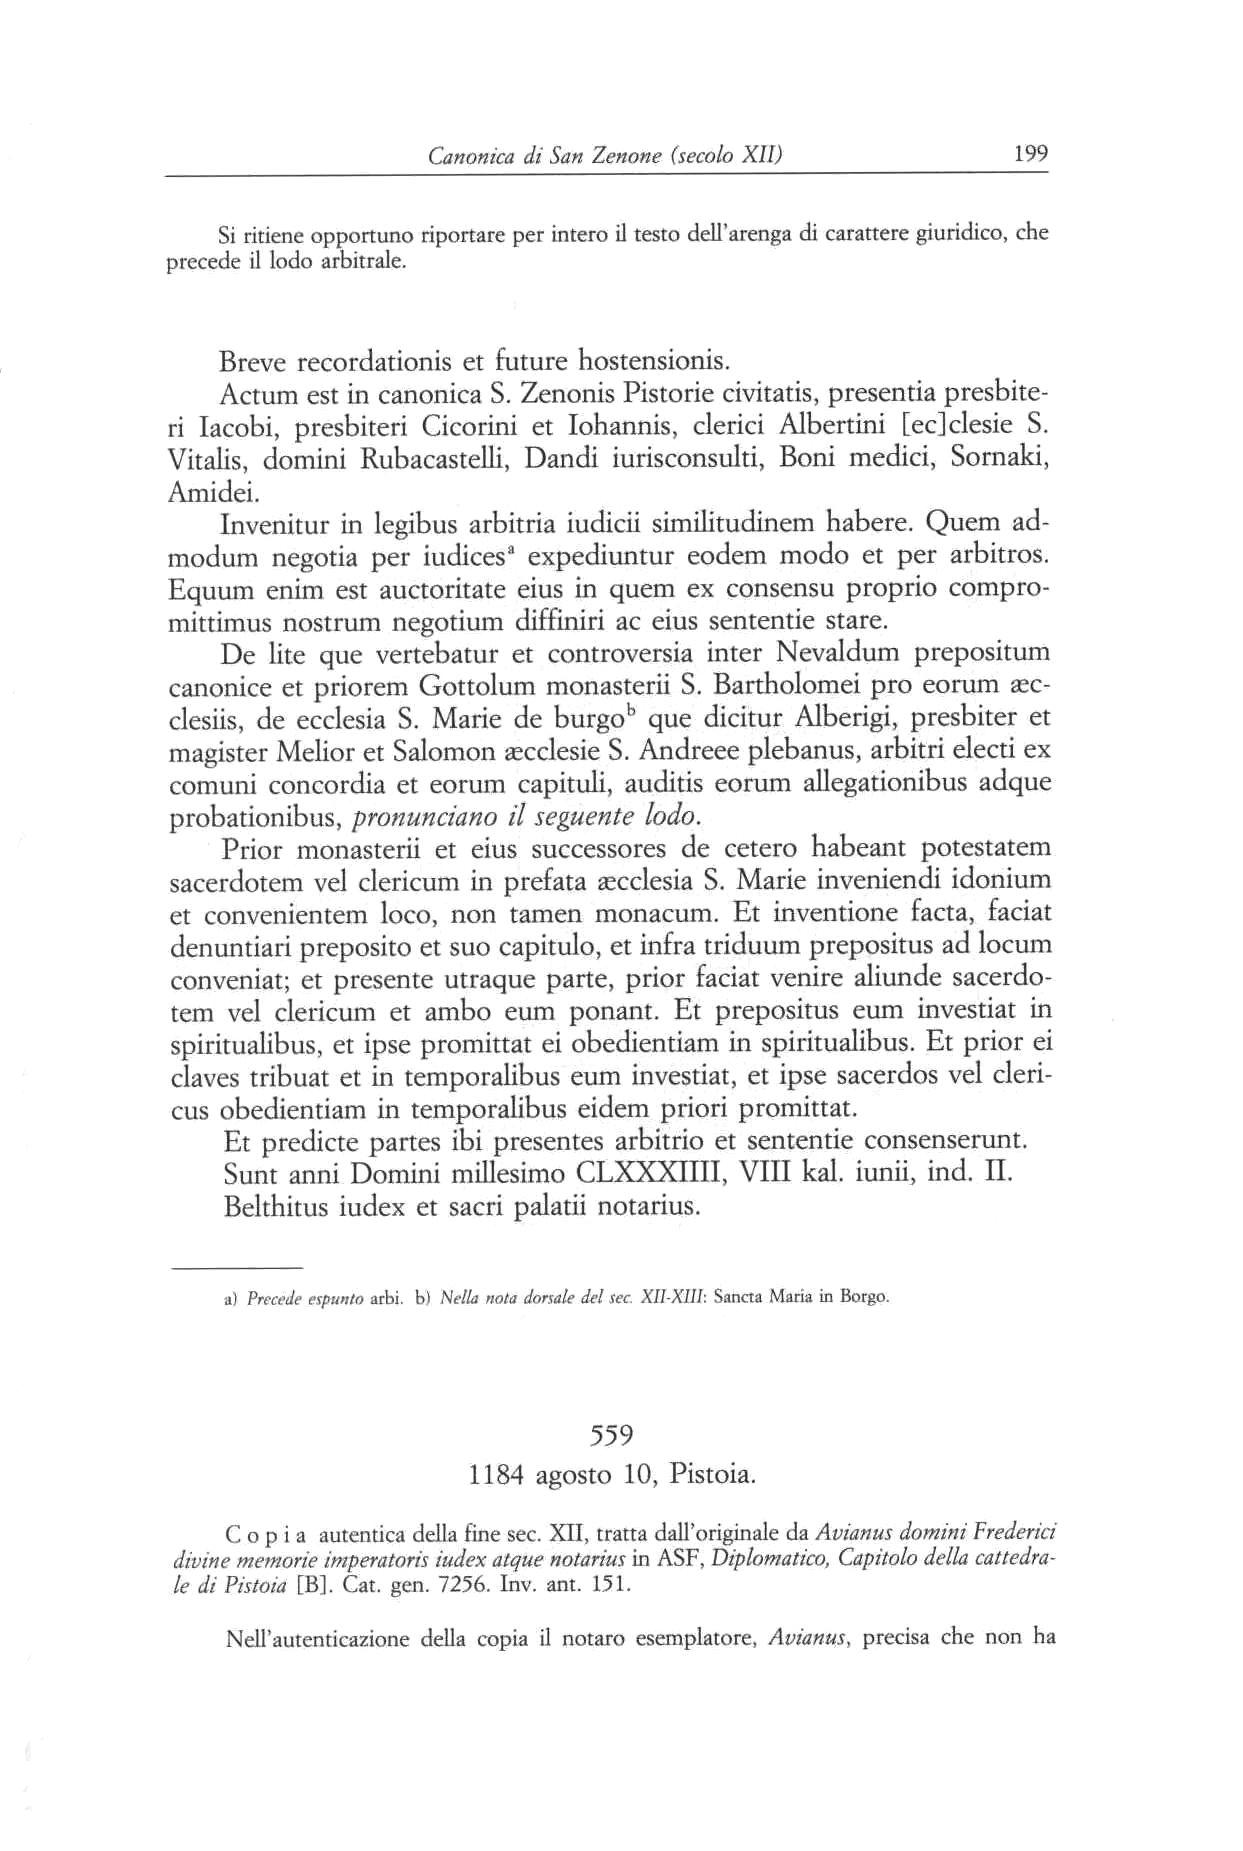 Canonica S. Zenone XII 0199.jpg